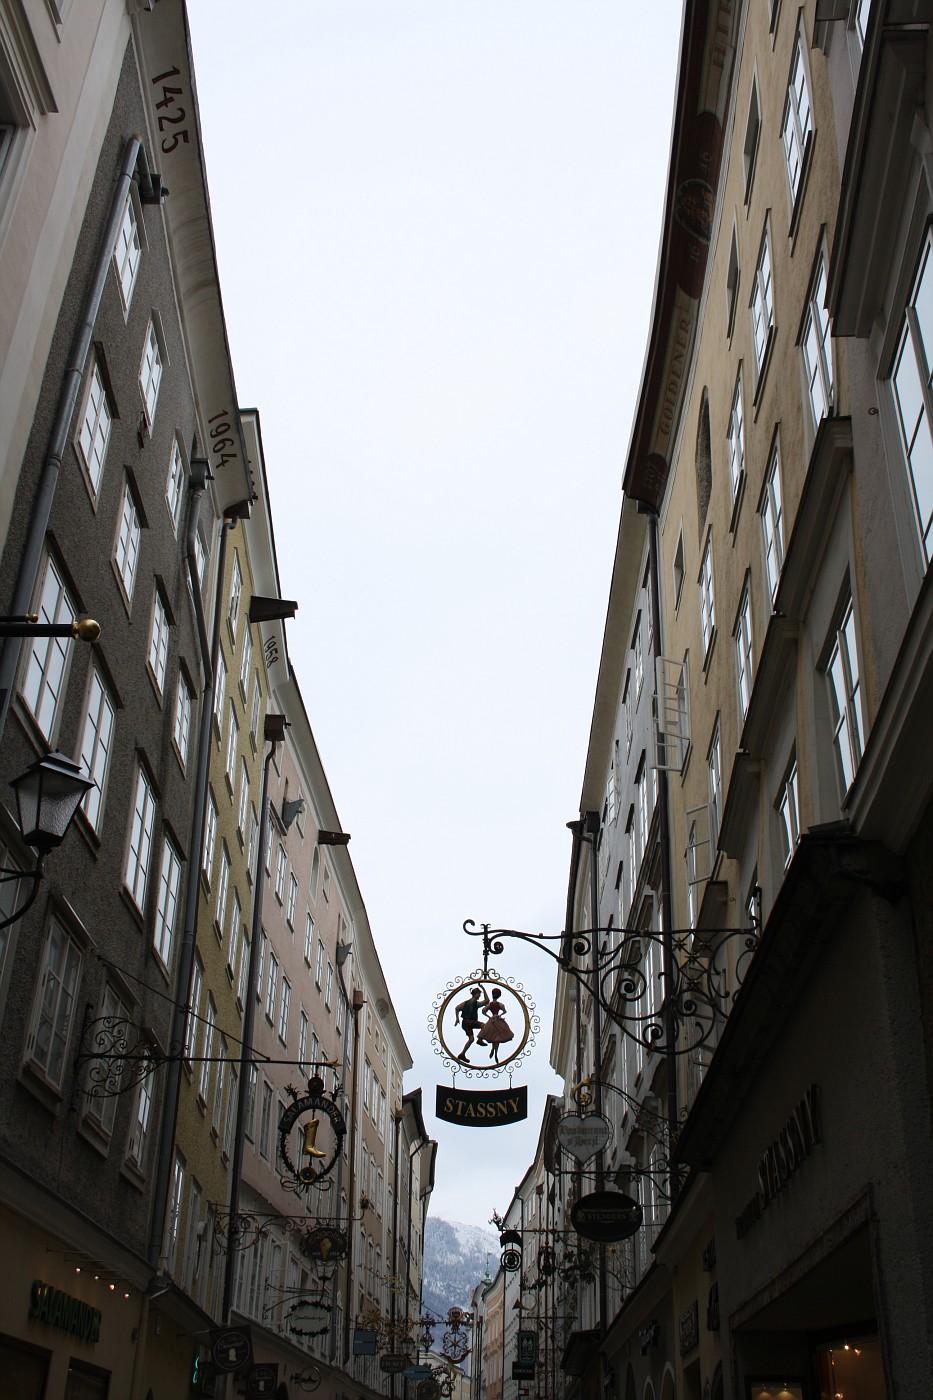 http://images21.fotki.com/v208/photos/2/243162/8488810/Salzburg11-vi.jpg